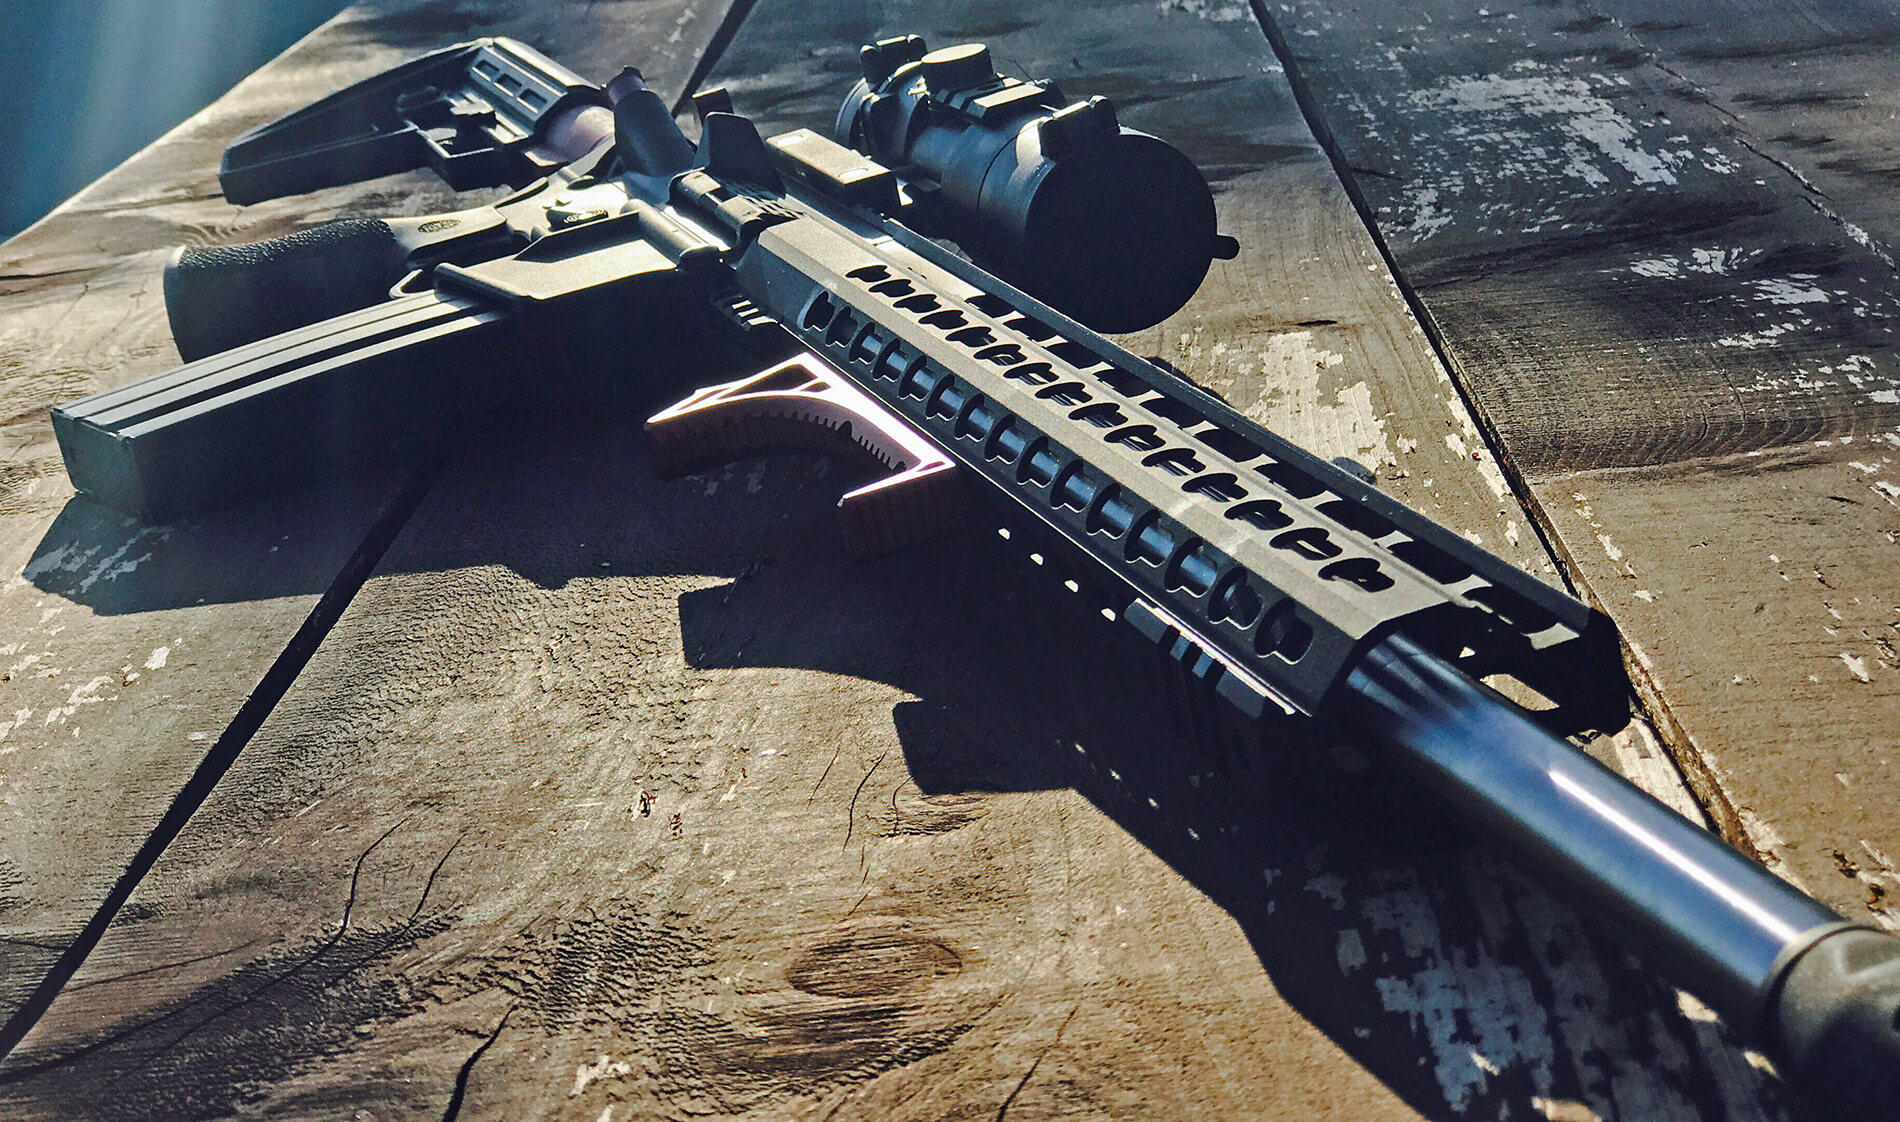 6.5 Grendel AR and magazine